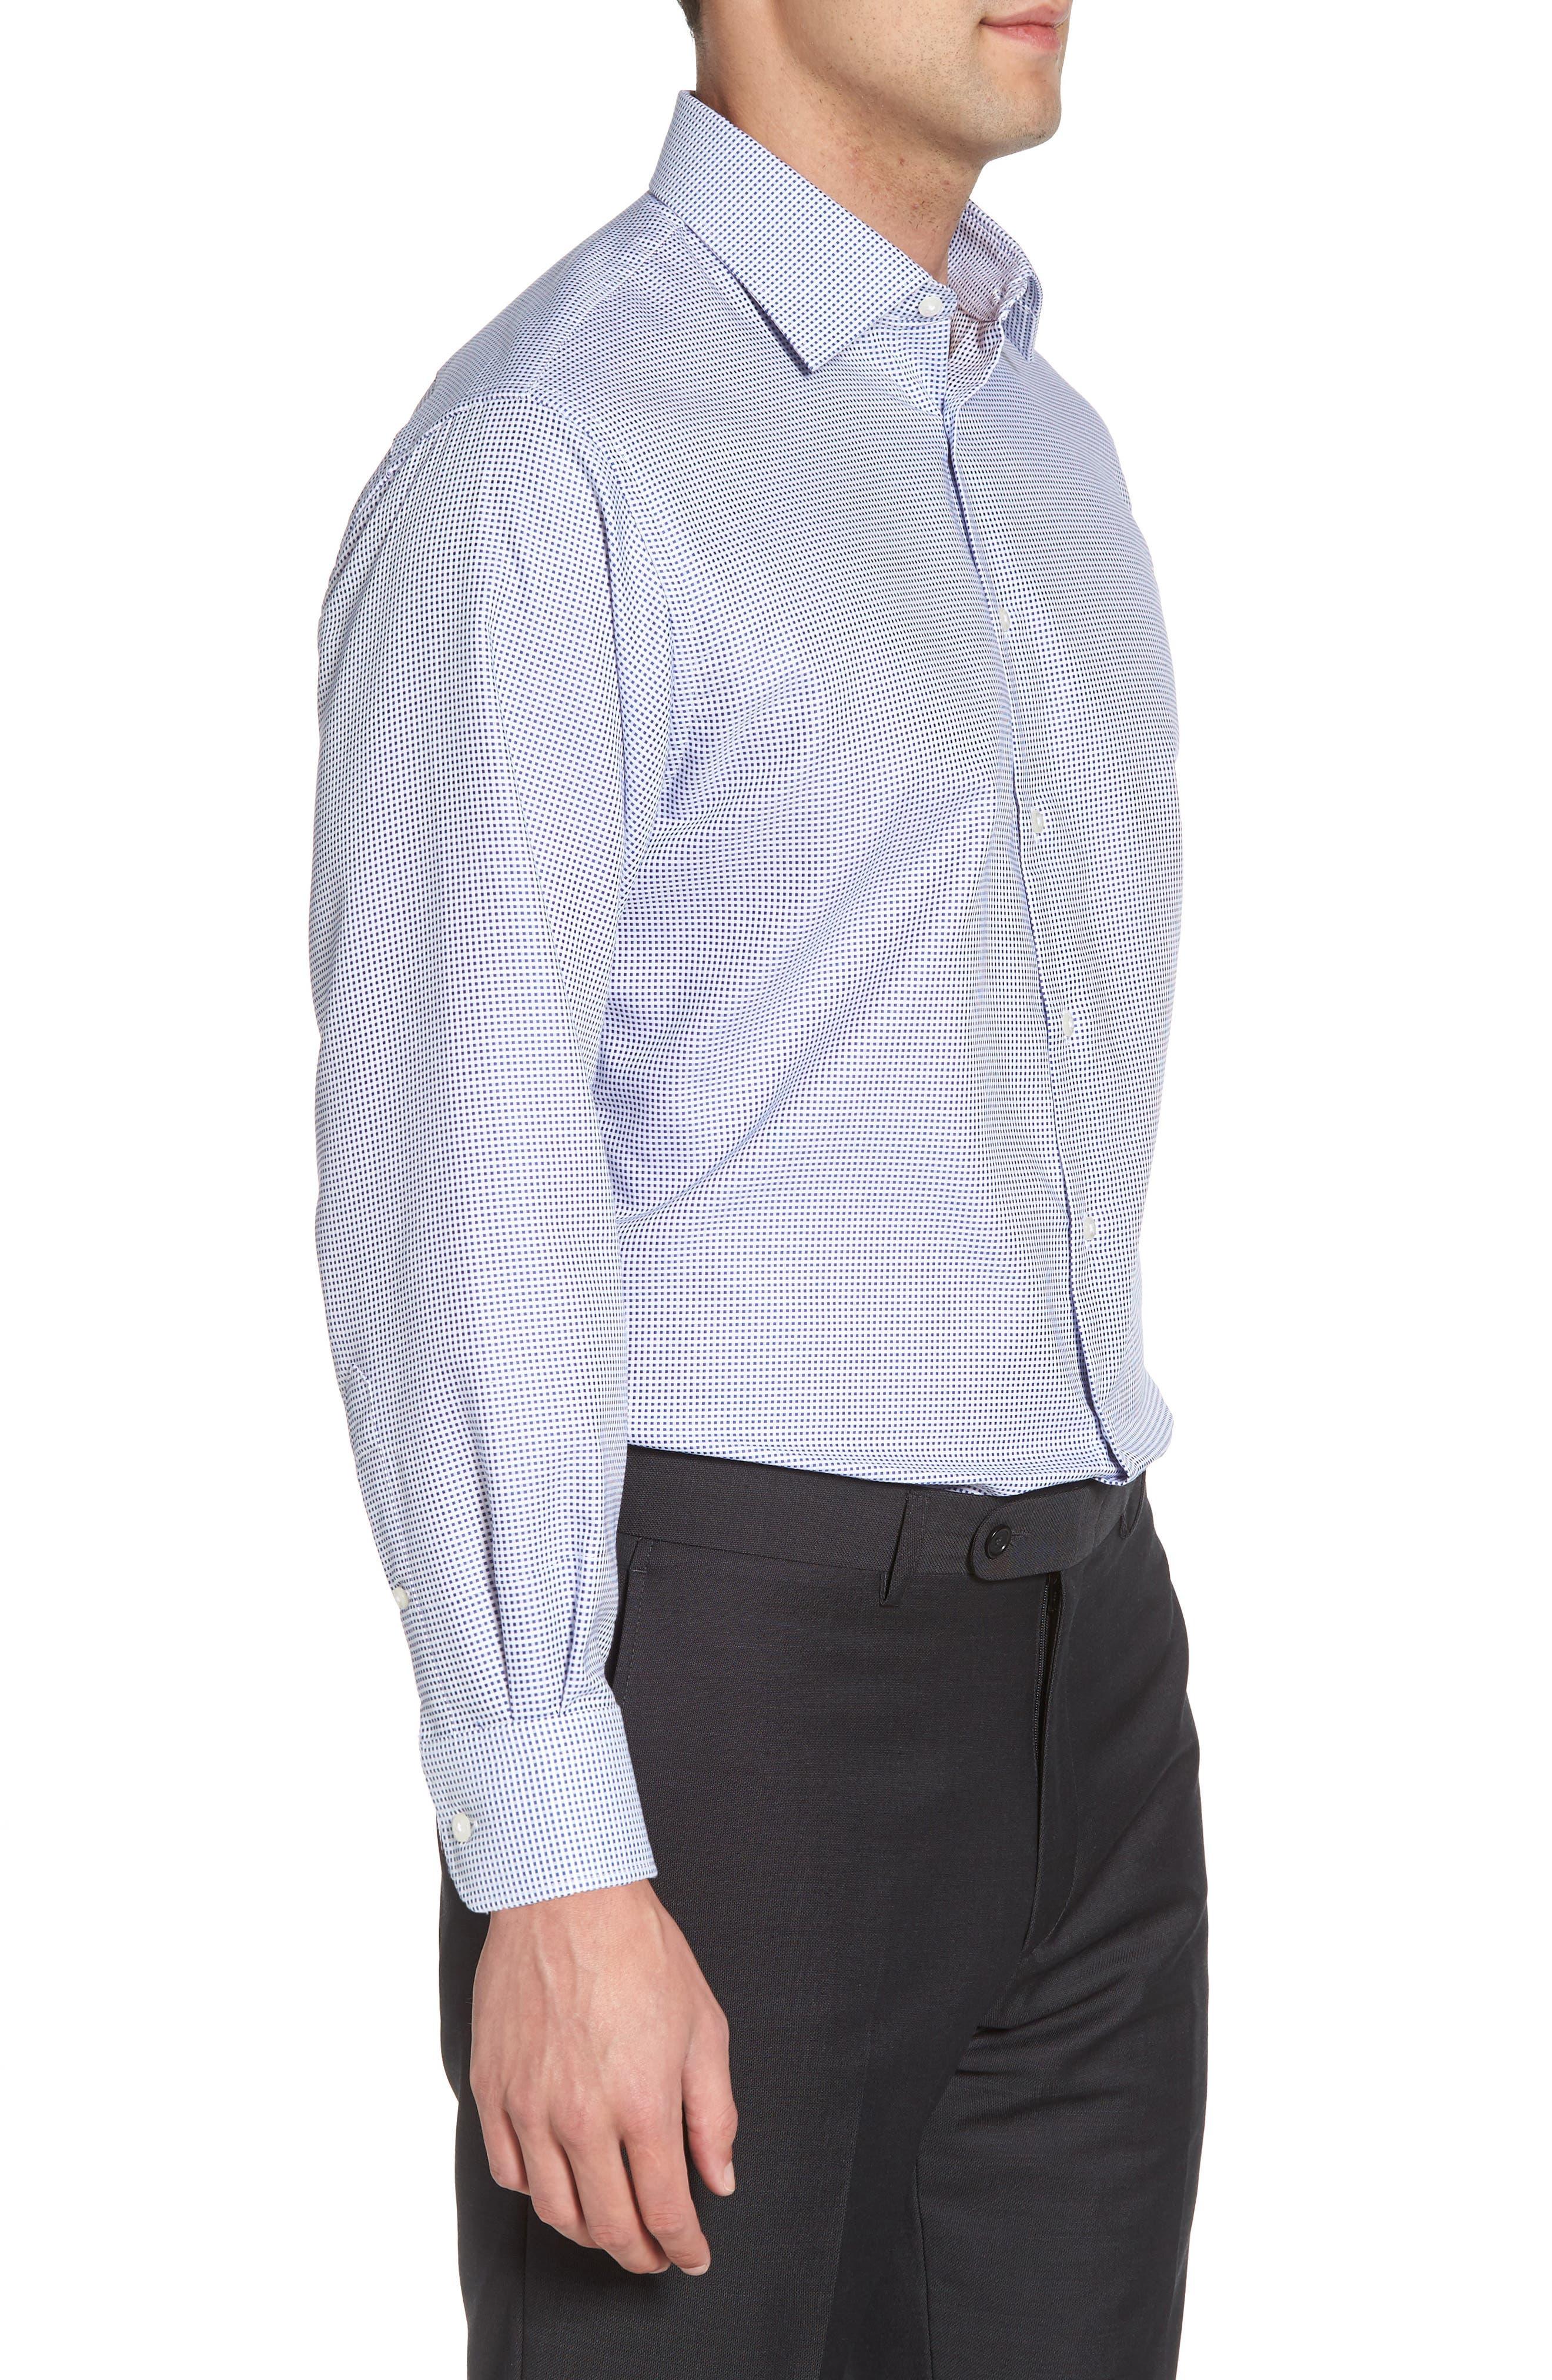 Alternate Image 3  - Nordstrom Men's Shop Classic Fit Microcheck Dress Shirt